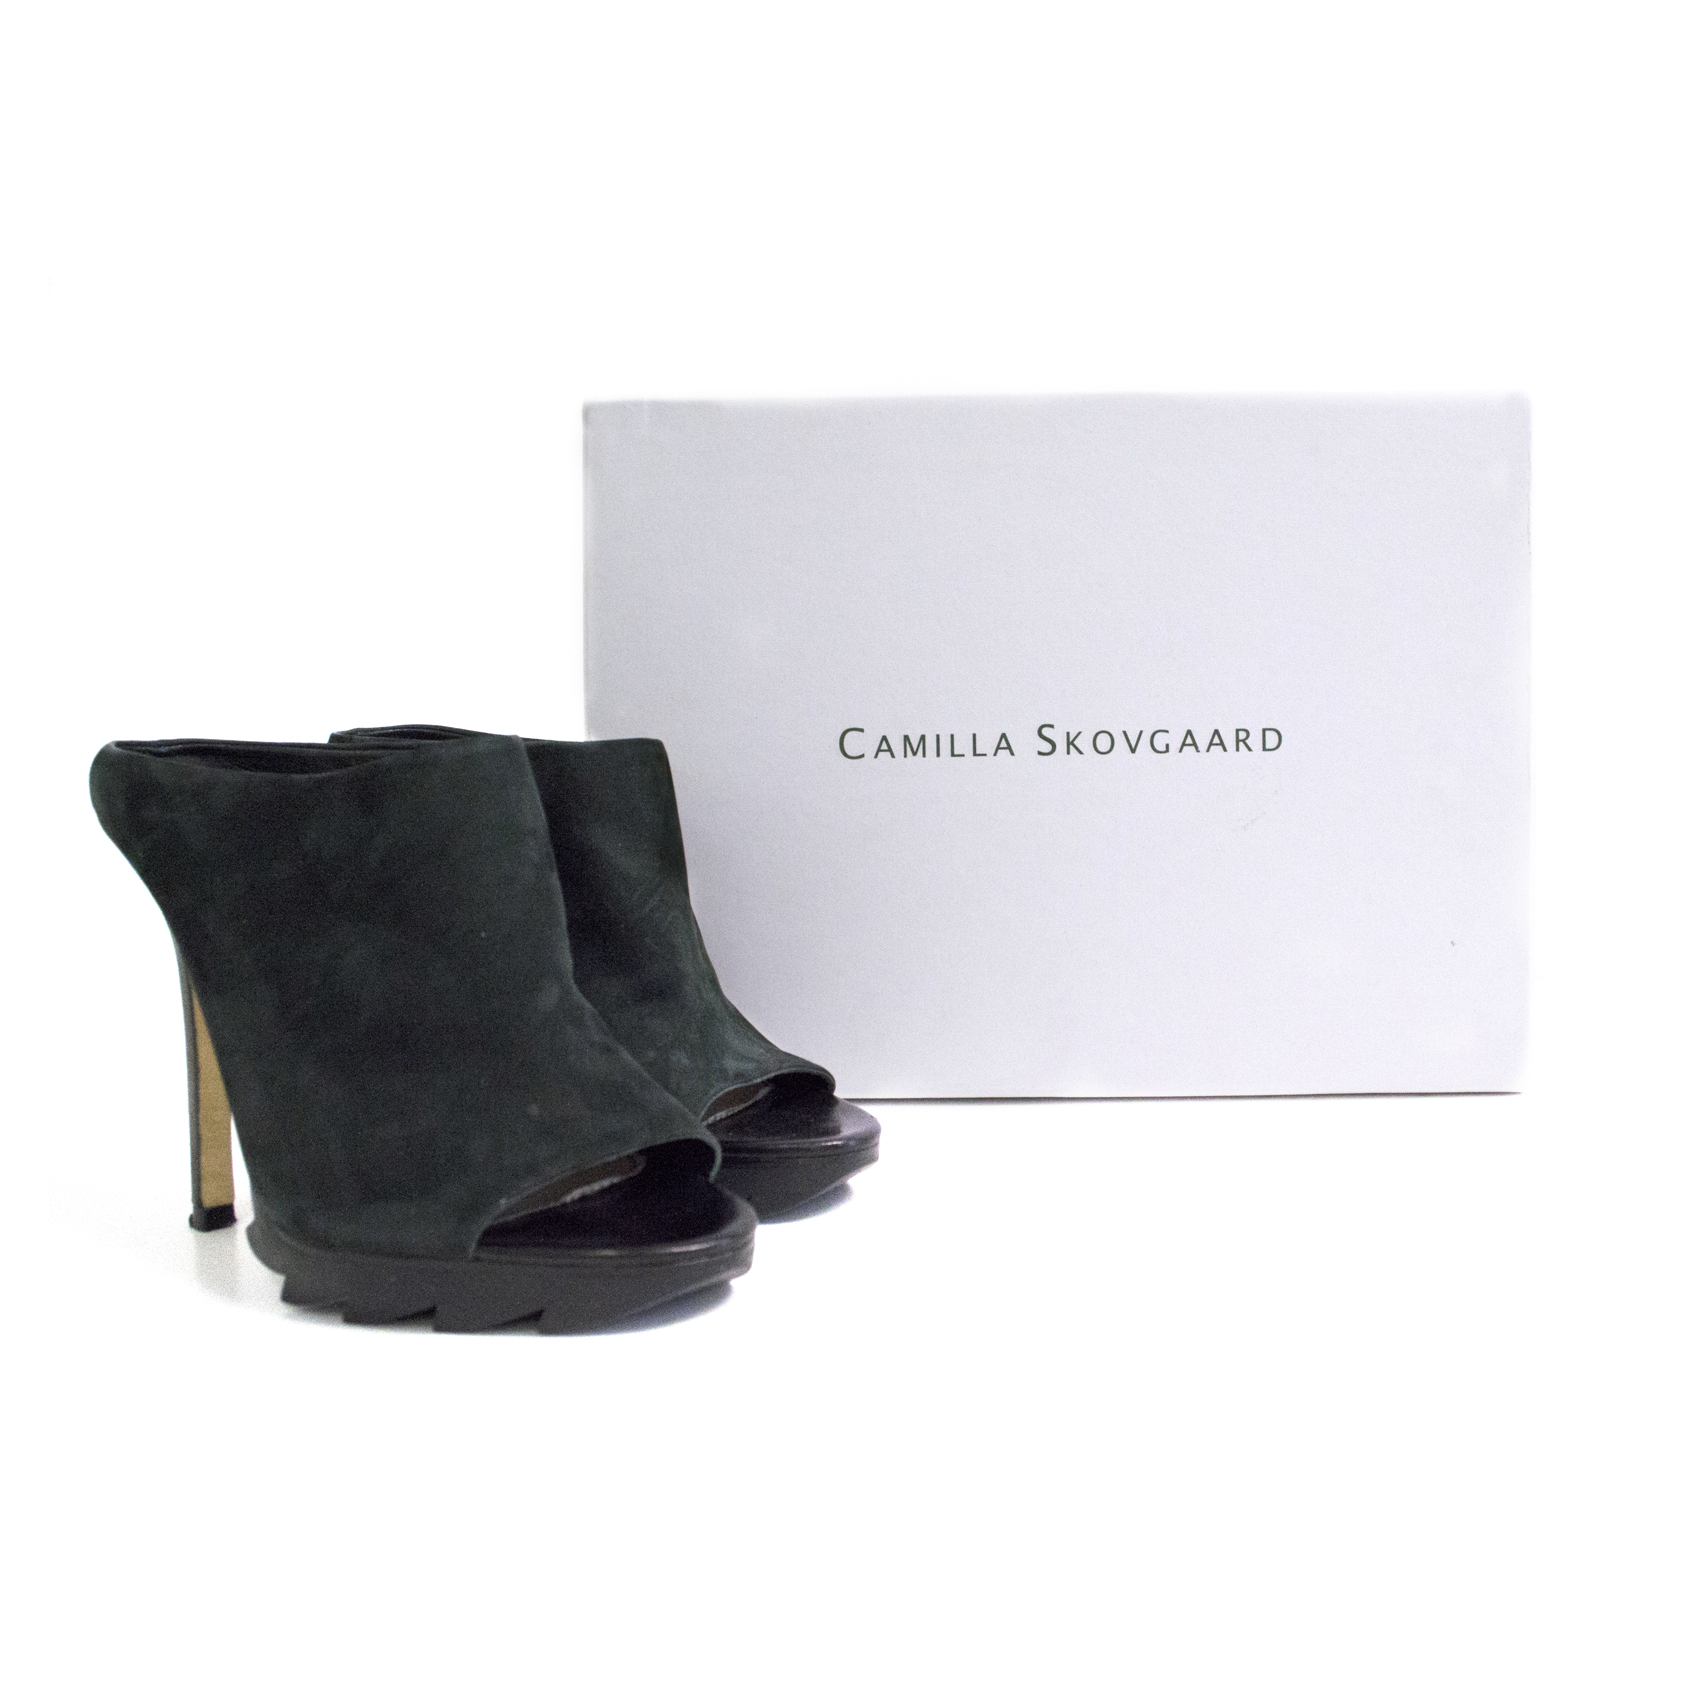 Camilla Skovgaard black Saw mules